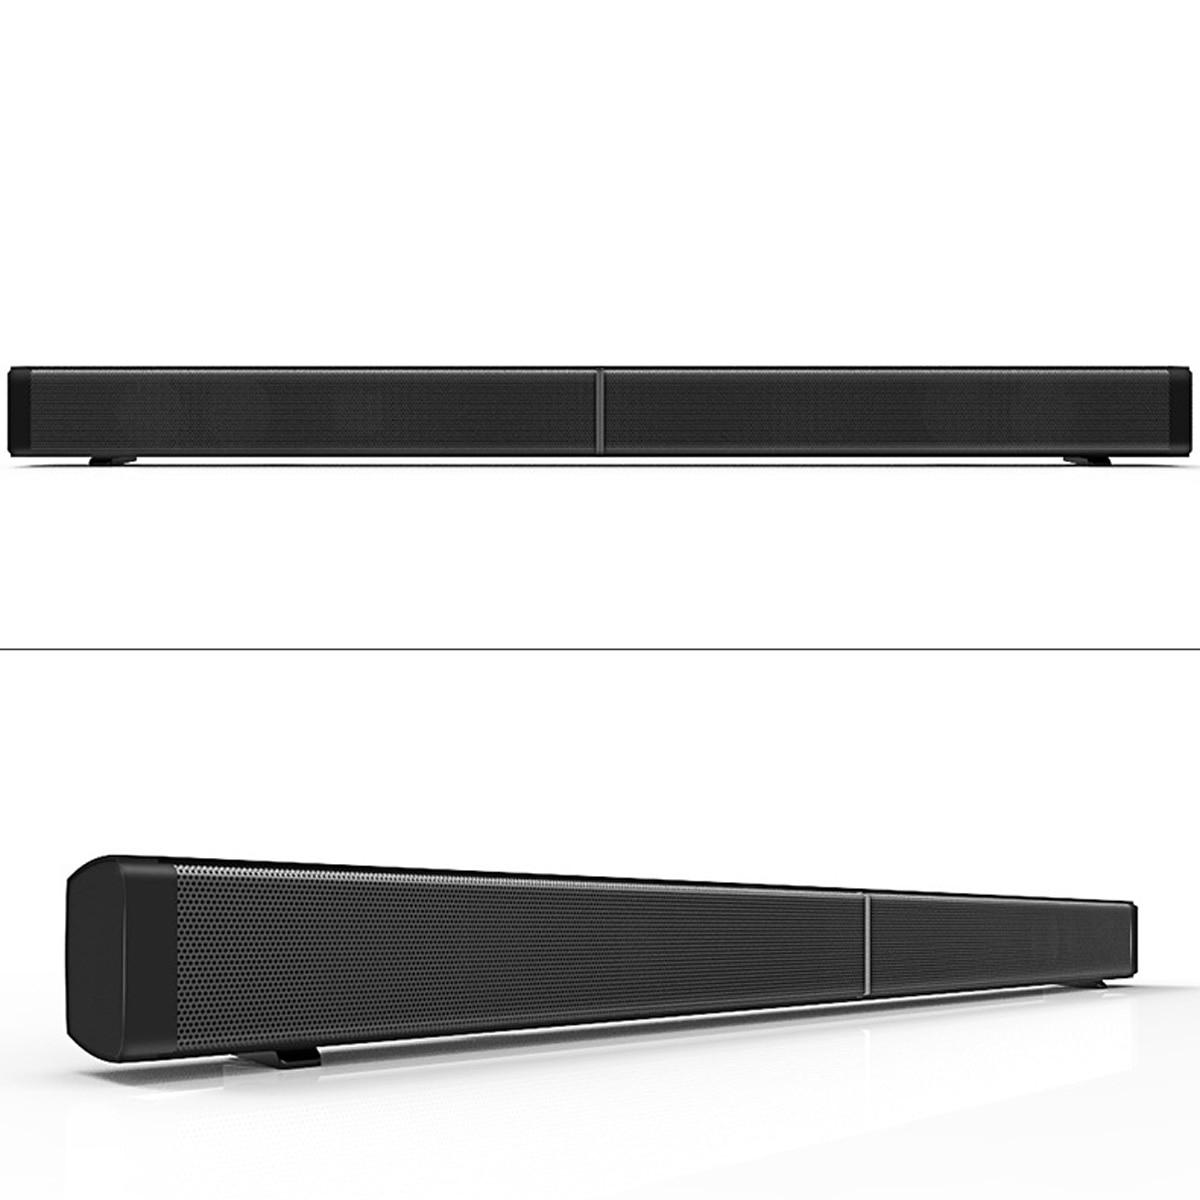 Sound Bar Home Theater System Soundbar Bluetooth Speaker Soundbar Super Bass